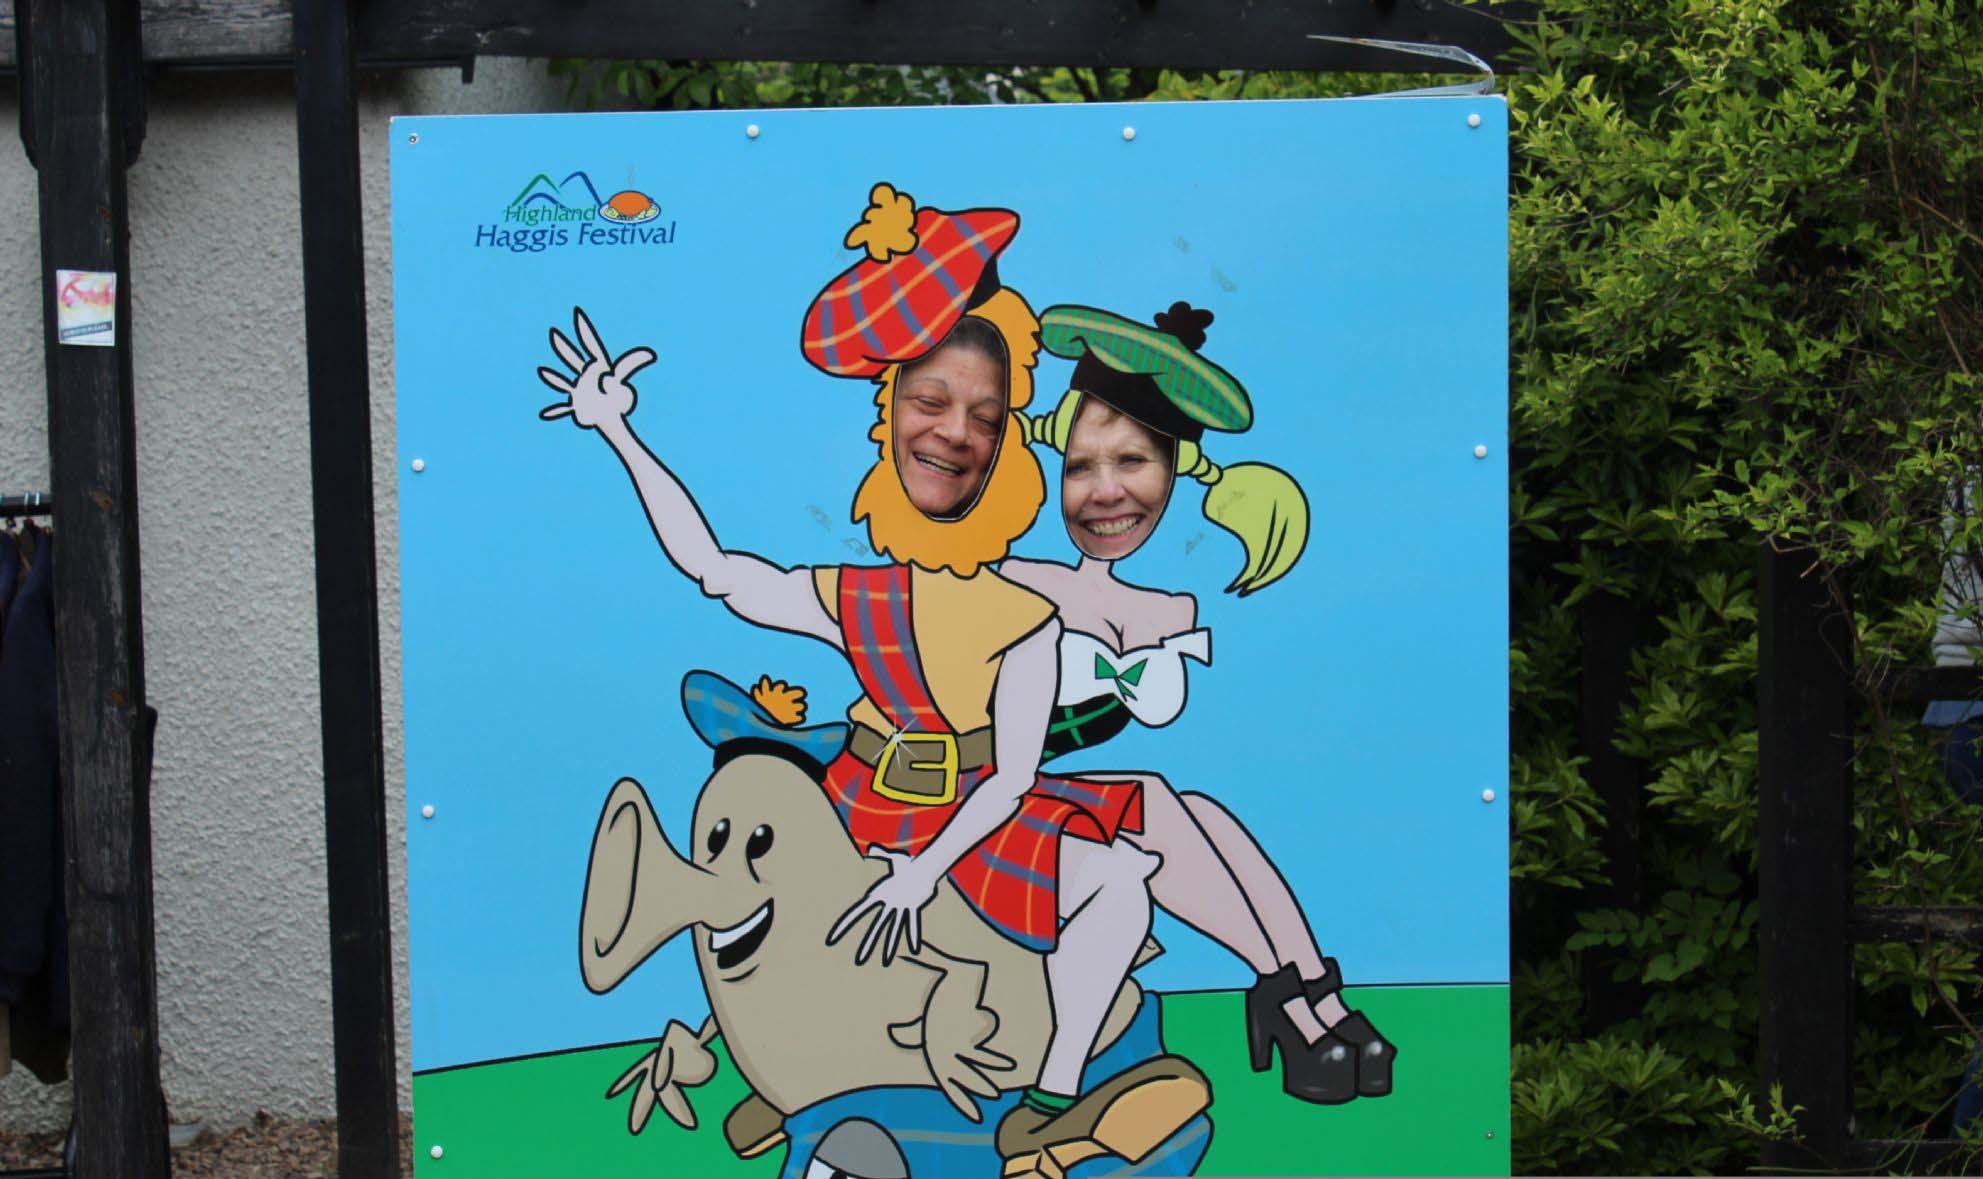 Two goofy tourists